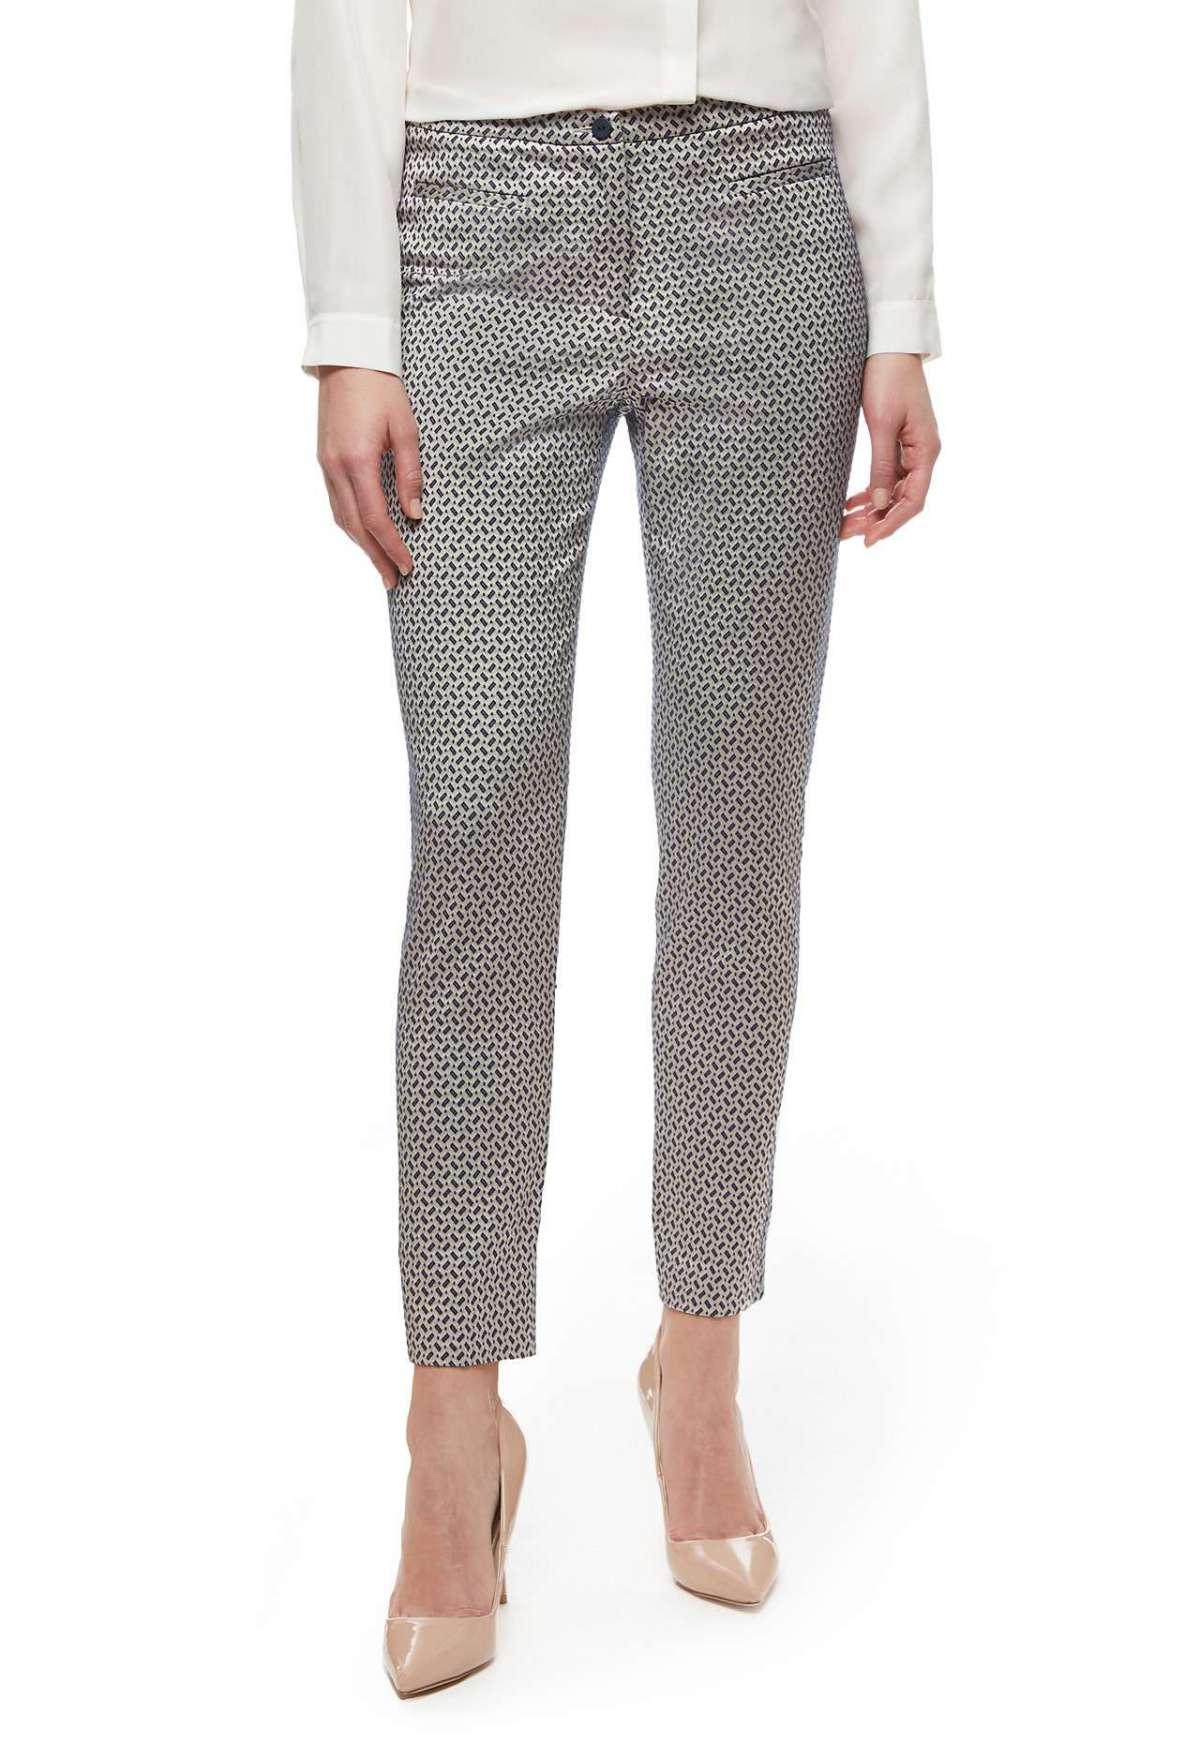 Pantaloni in jacquard geometrico Stefanel a 145 euro